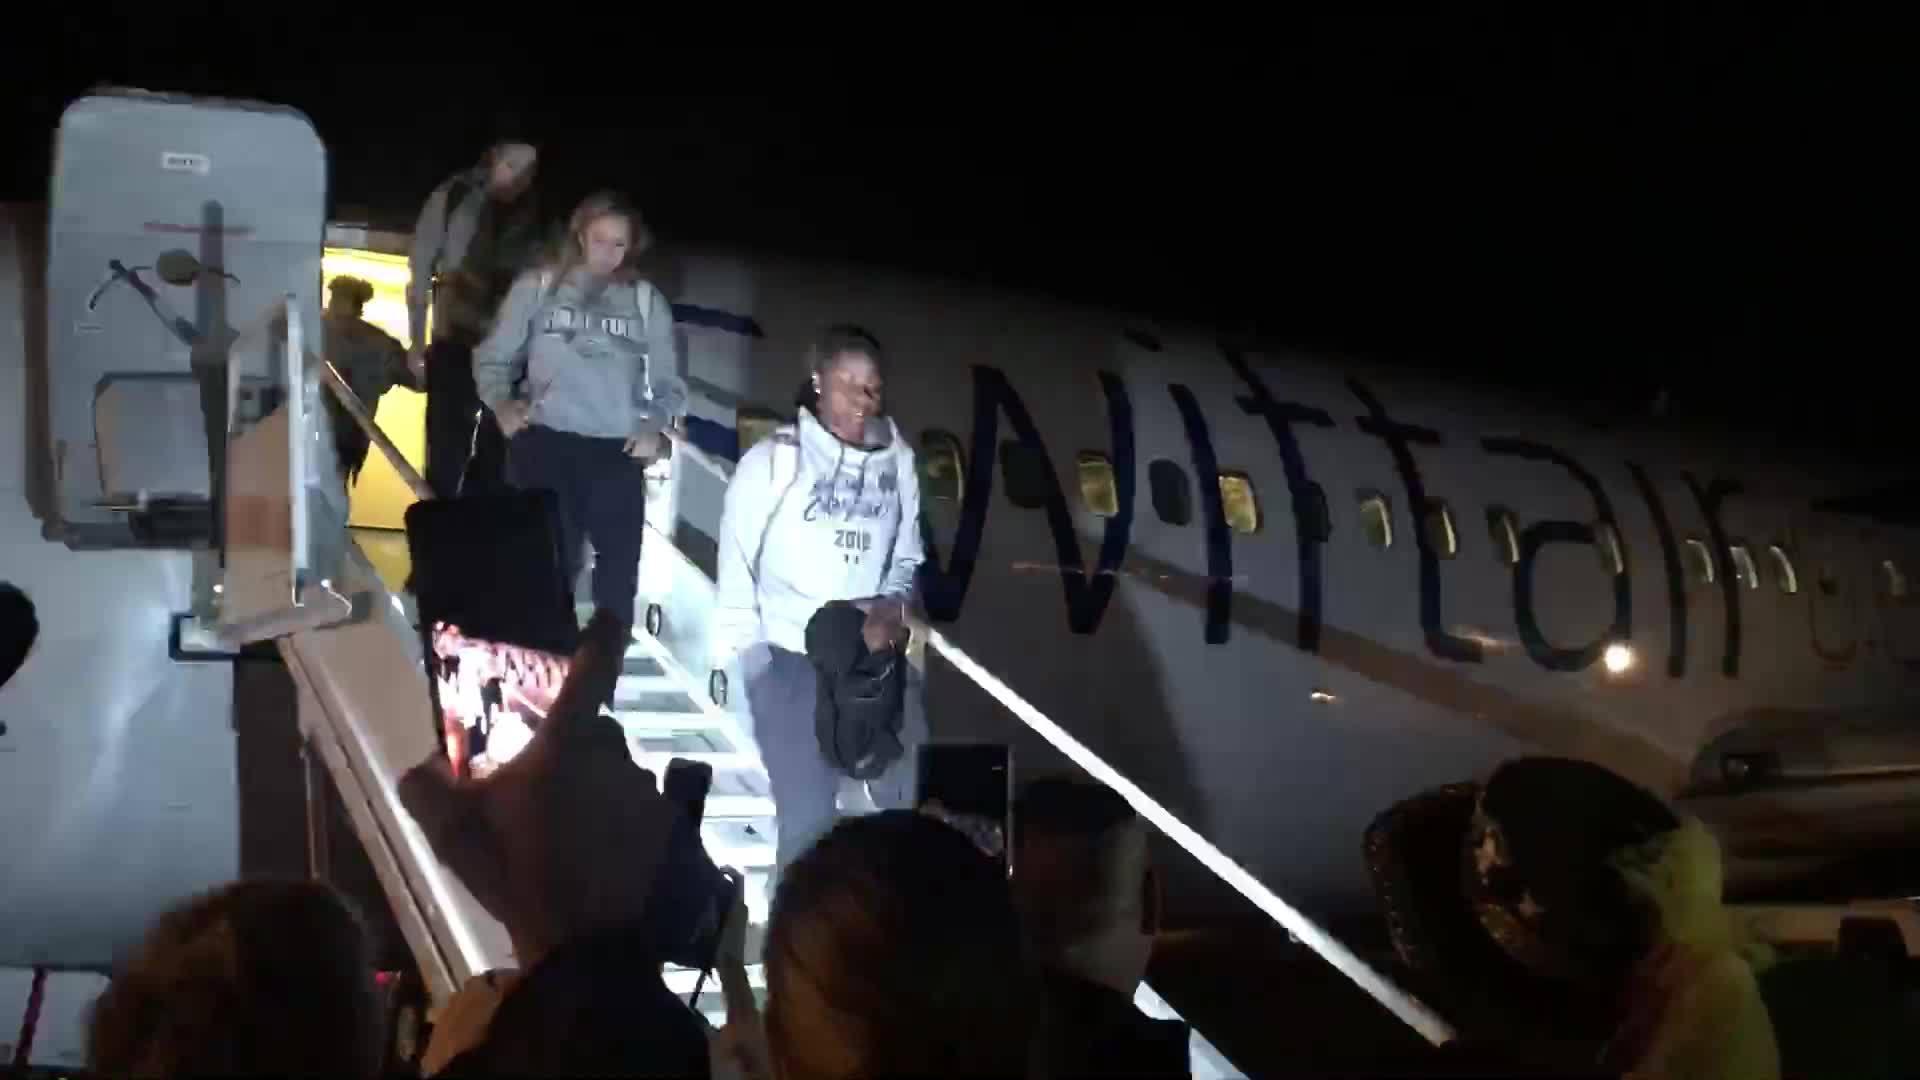 Notre Dame arrive ahead of Women's Final 4 in Tampa